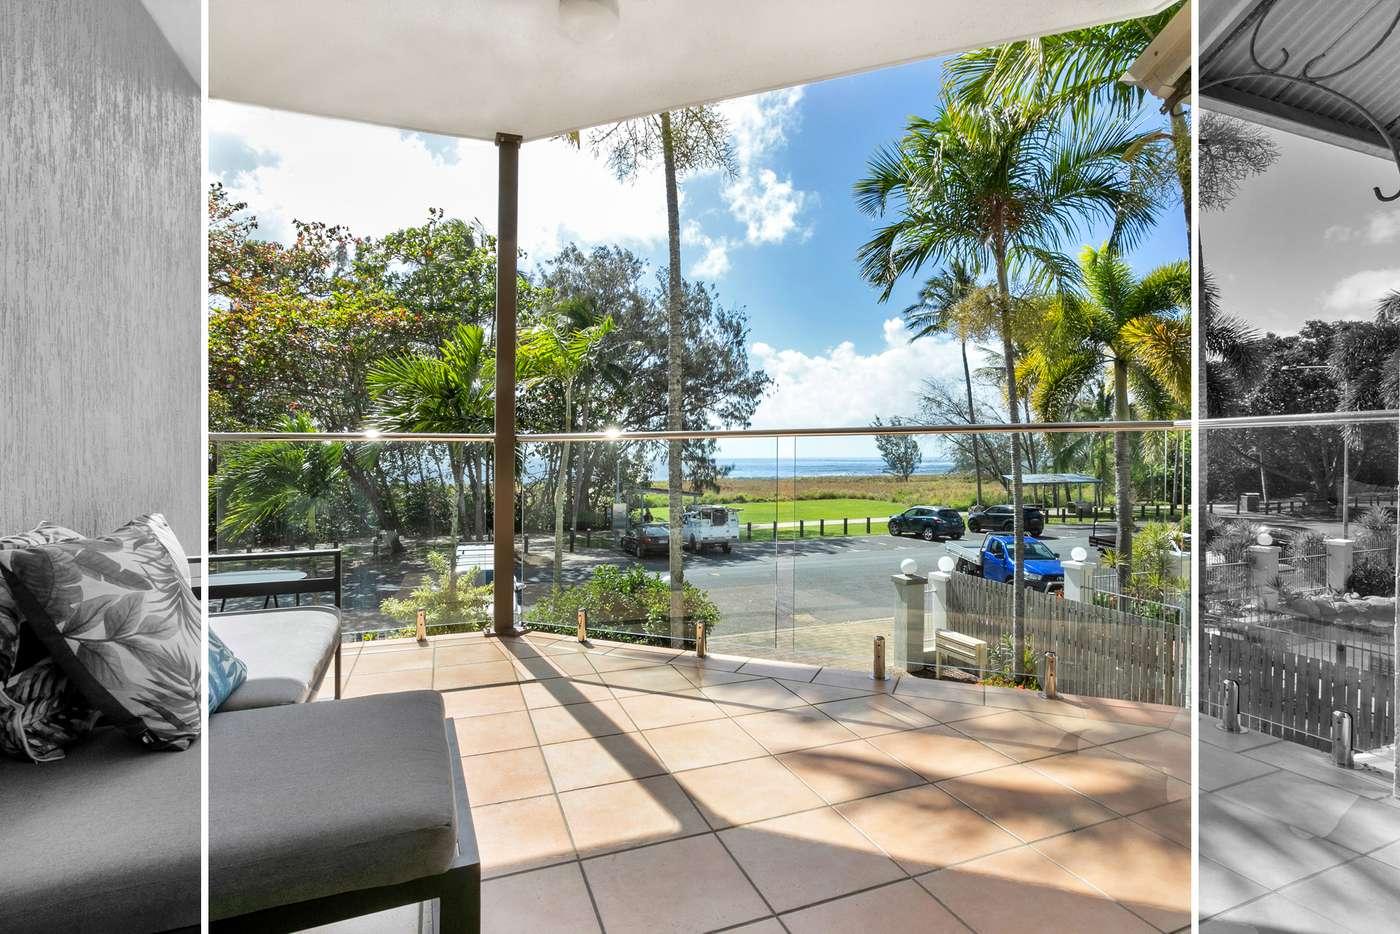 Main view of Homely unit listing, 3/41 Sims Esplanade, Yorkeys Knob QLD 4878